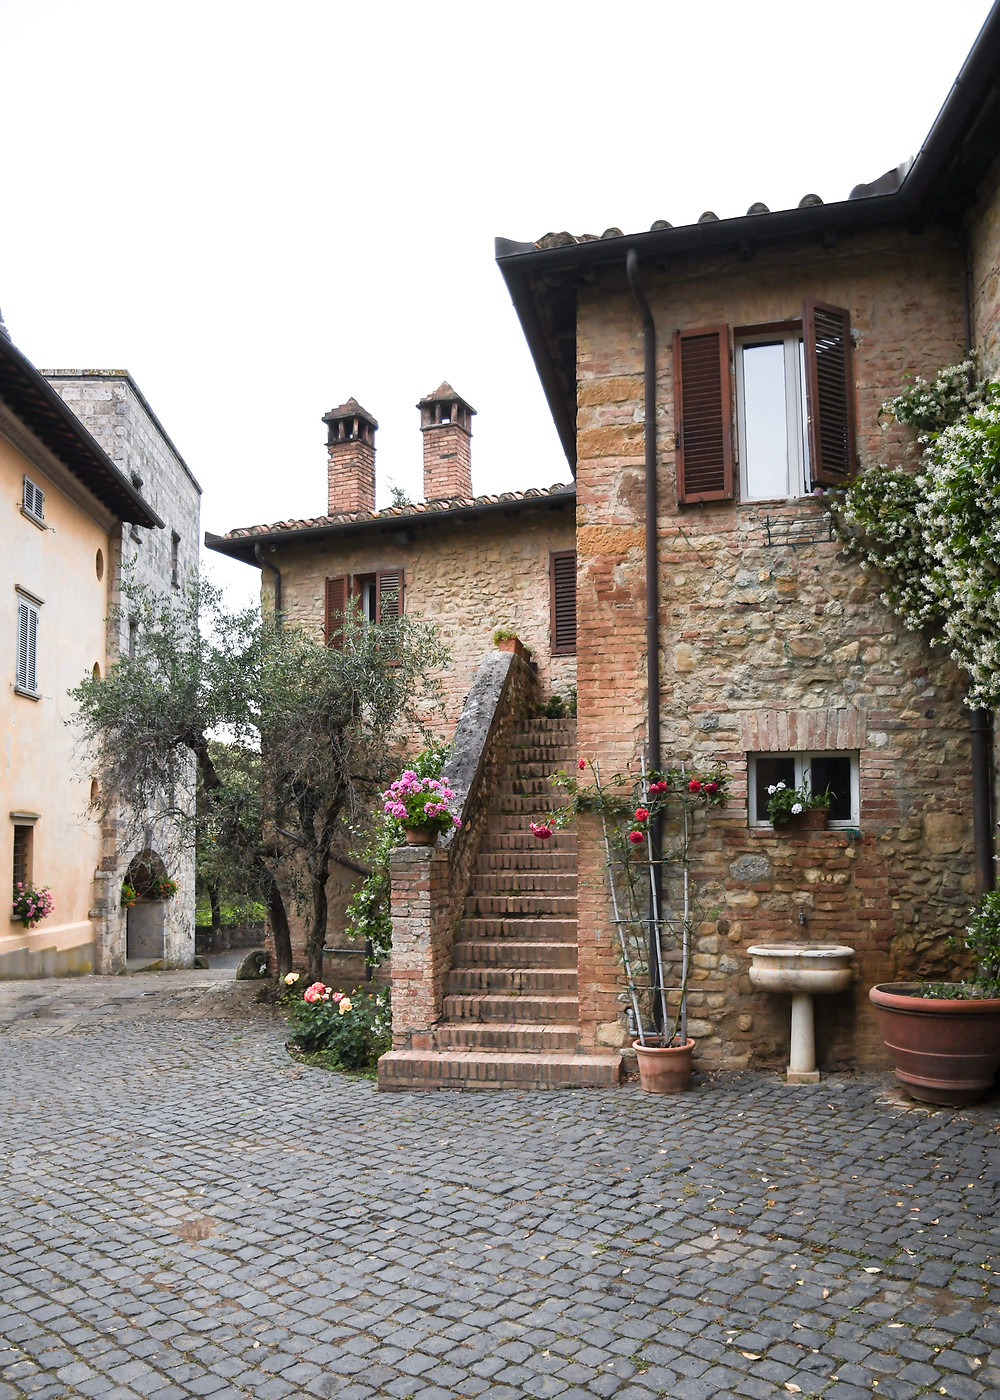 La Torre Alle Tolfe, Siena, Tuscany